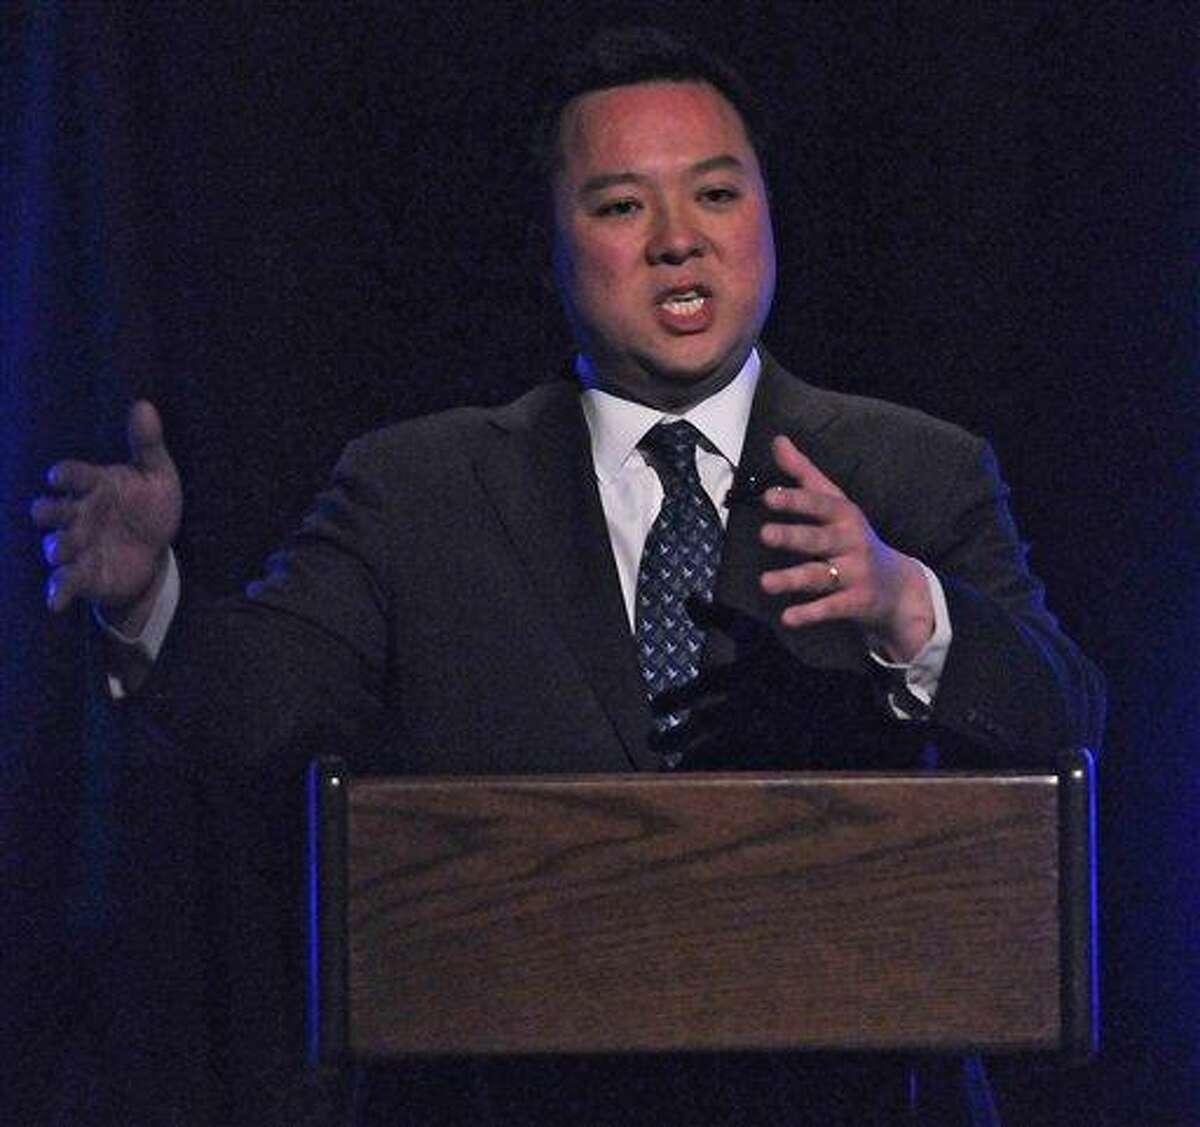 Democratic Senate candidate for U.S. Senate, state Rep. William Tong gestures April 9 during a debate in Storrs. Associated Press file photo